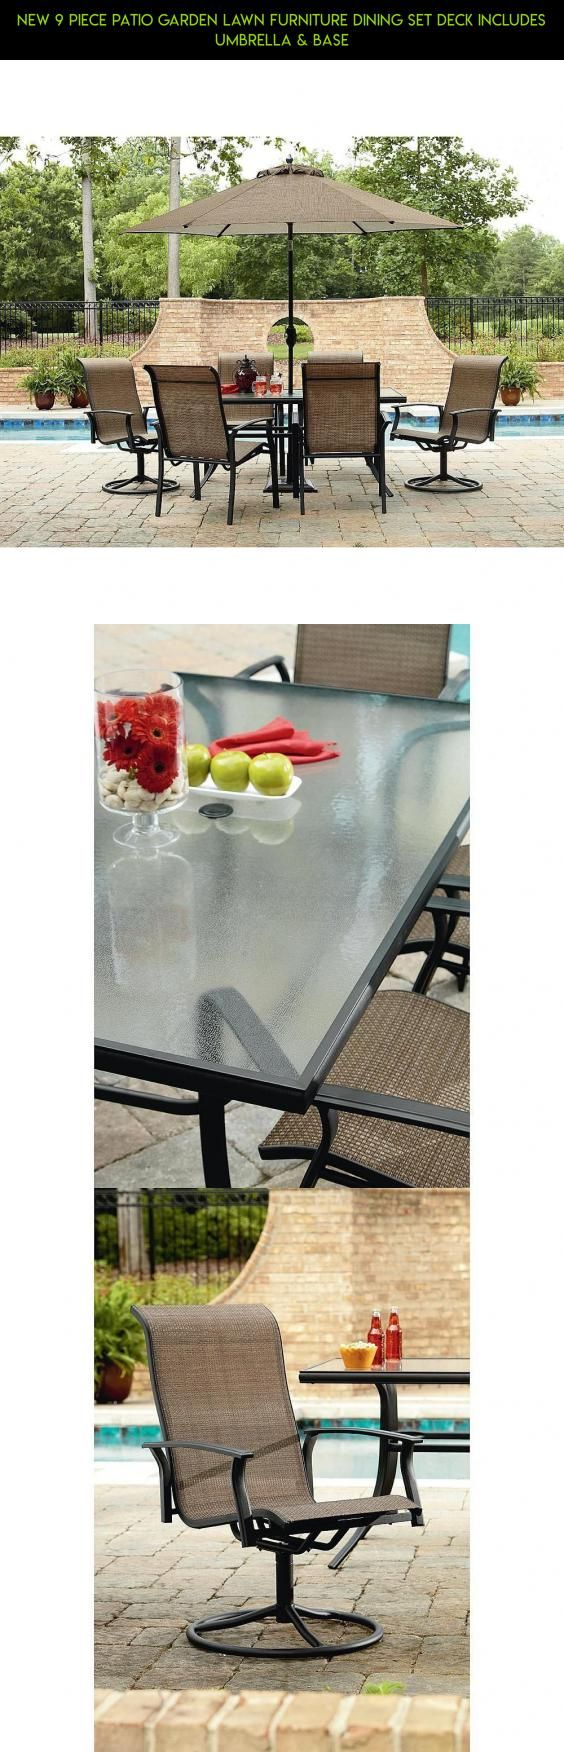 NEW 9 Piece Patio Garden Lawn Furniture Dining Set Deck INCLUDES UMBRELLA U0026  BASE #products